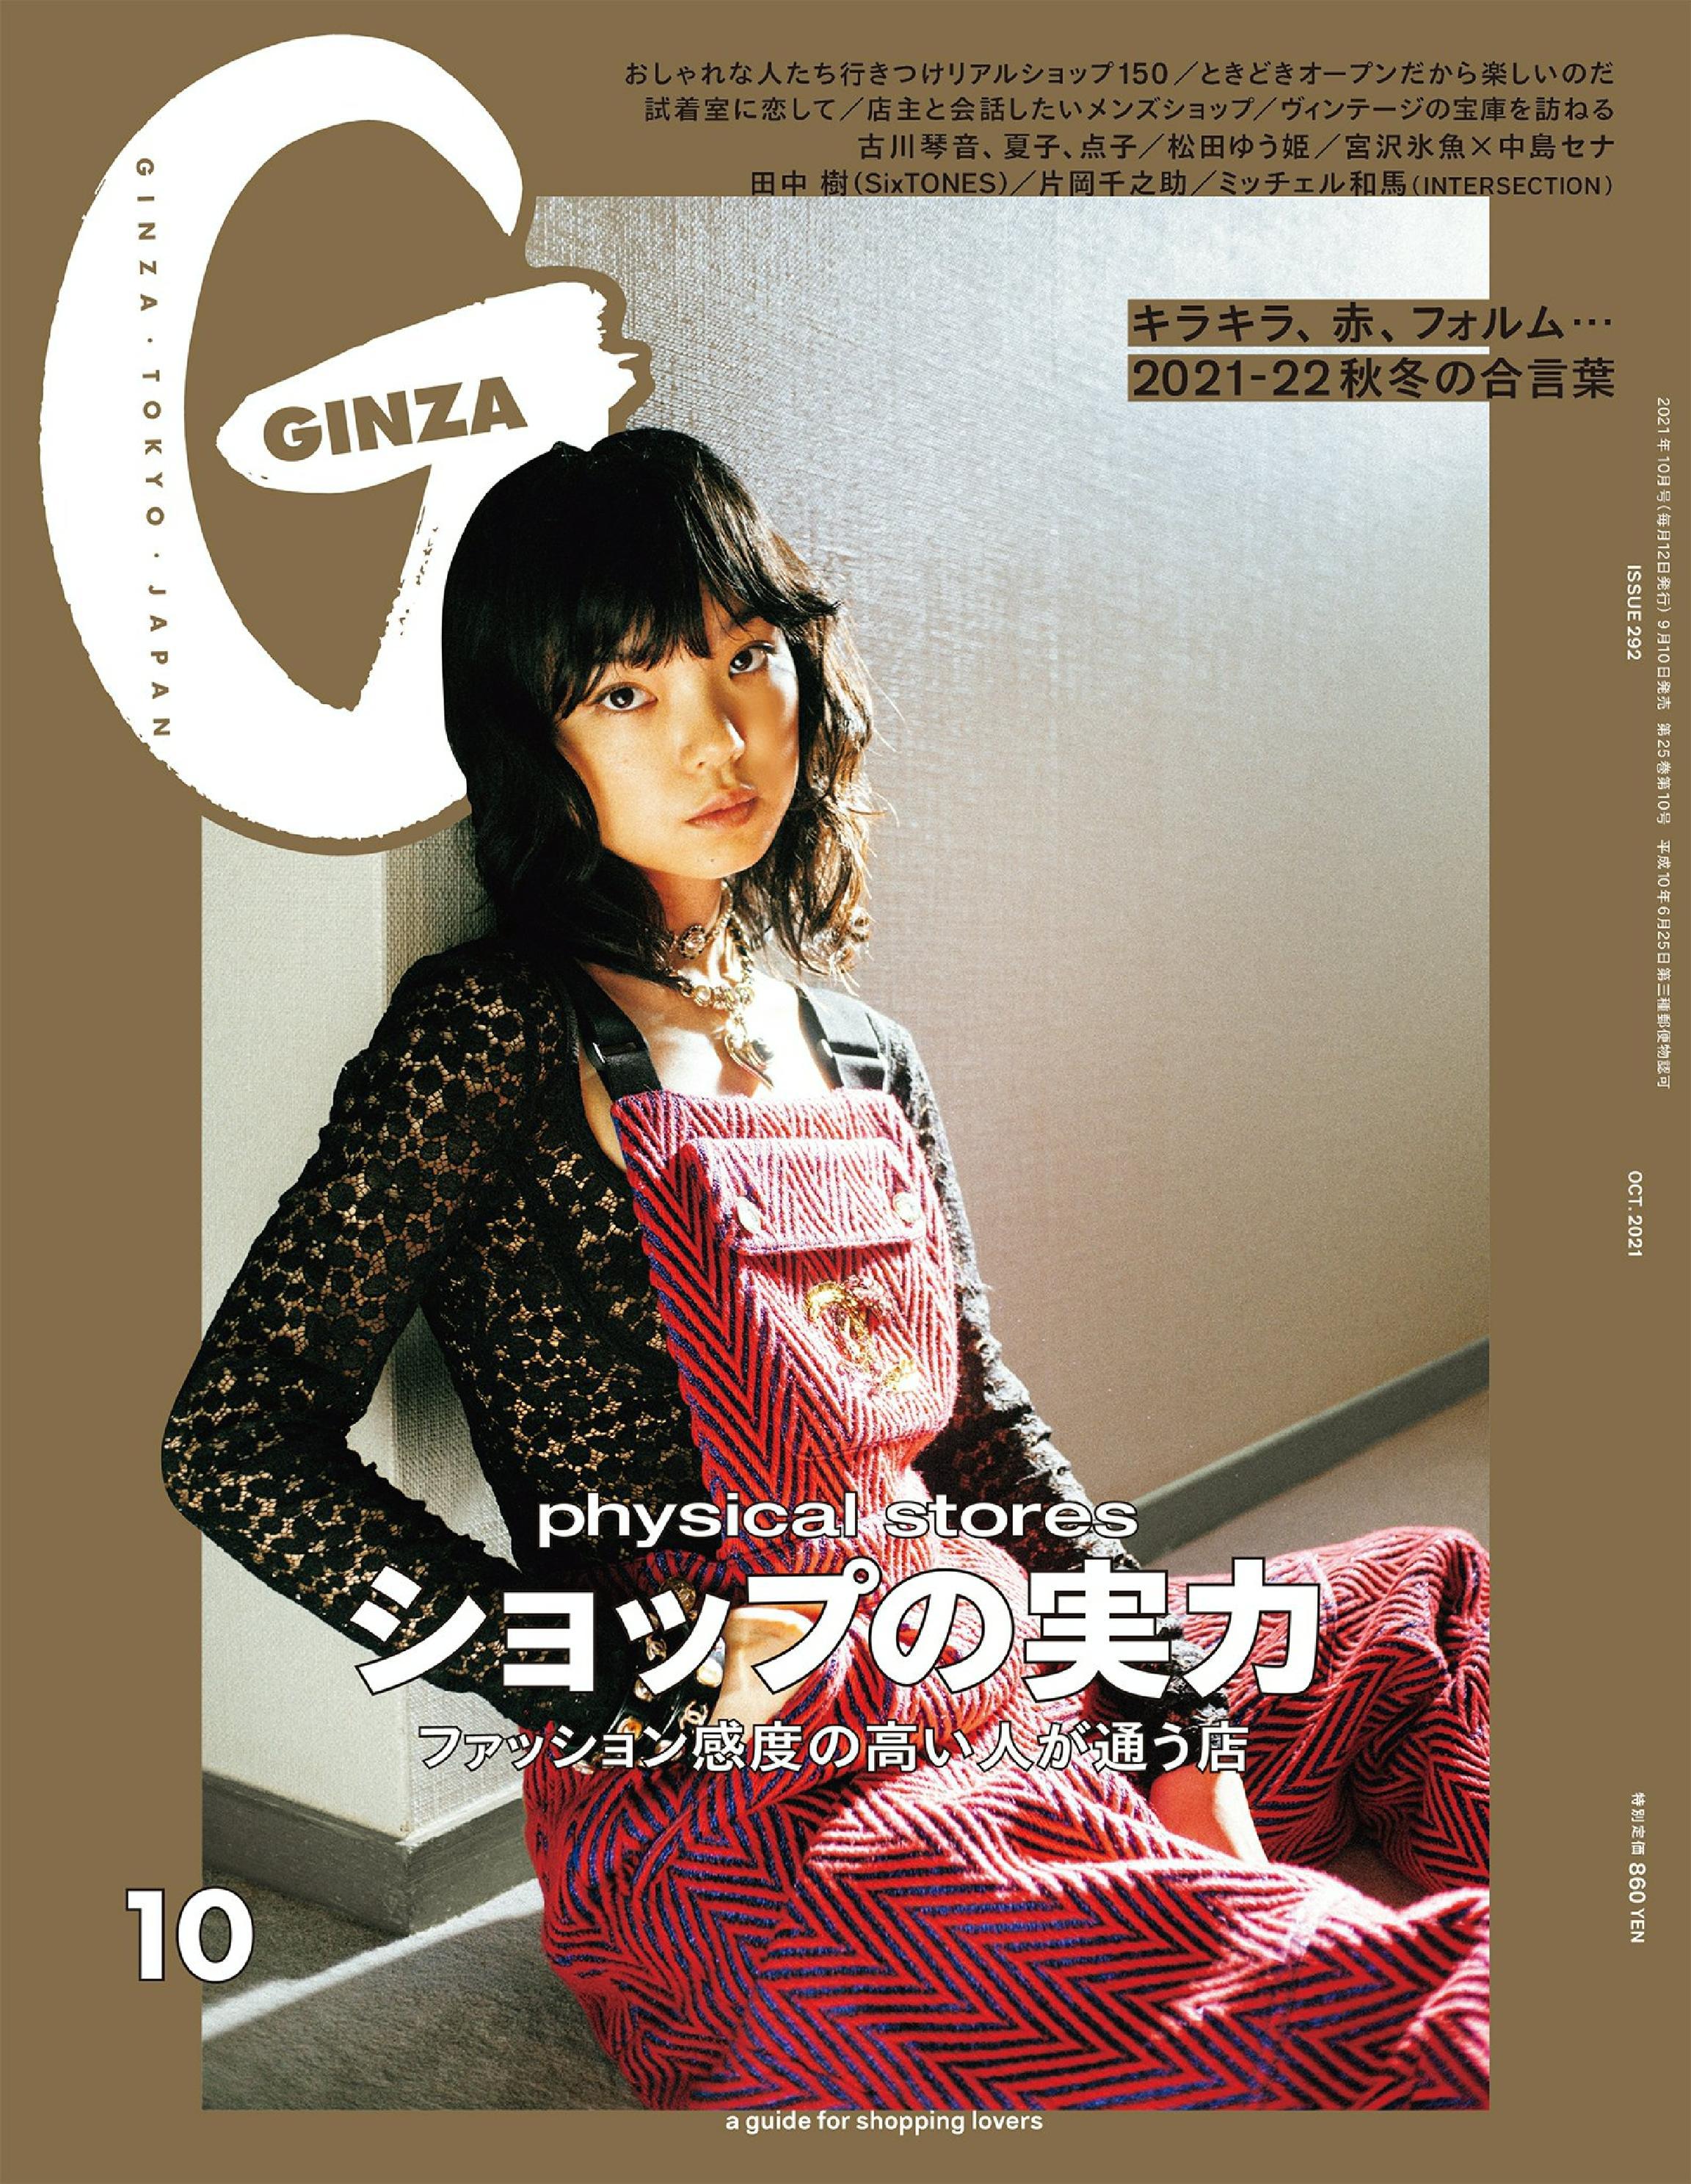 GINZA (ギンザ) – 9月 2021